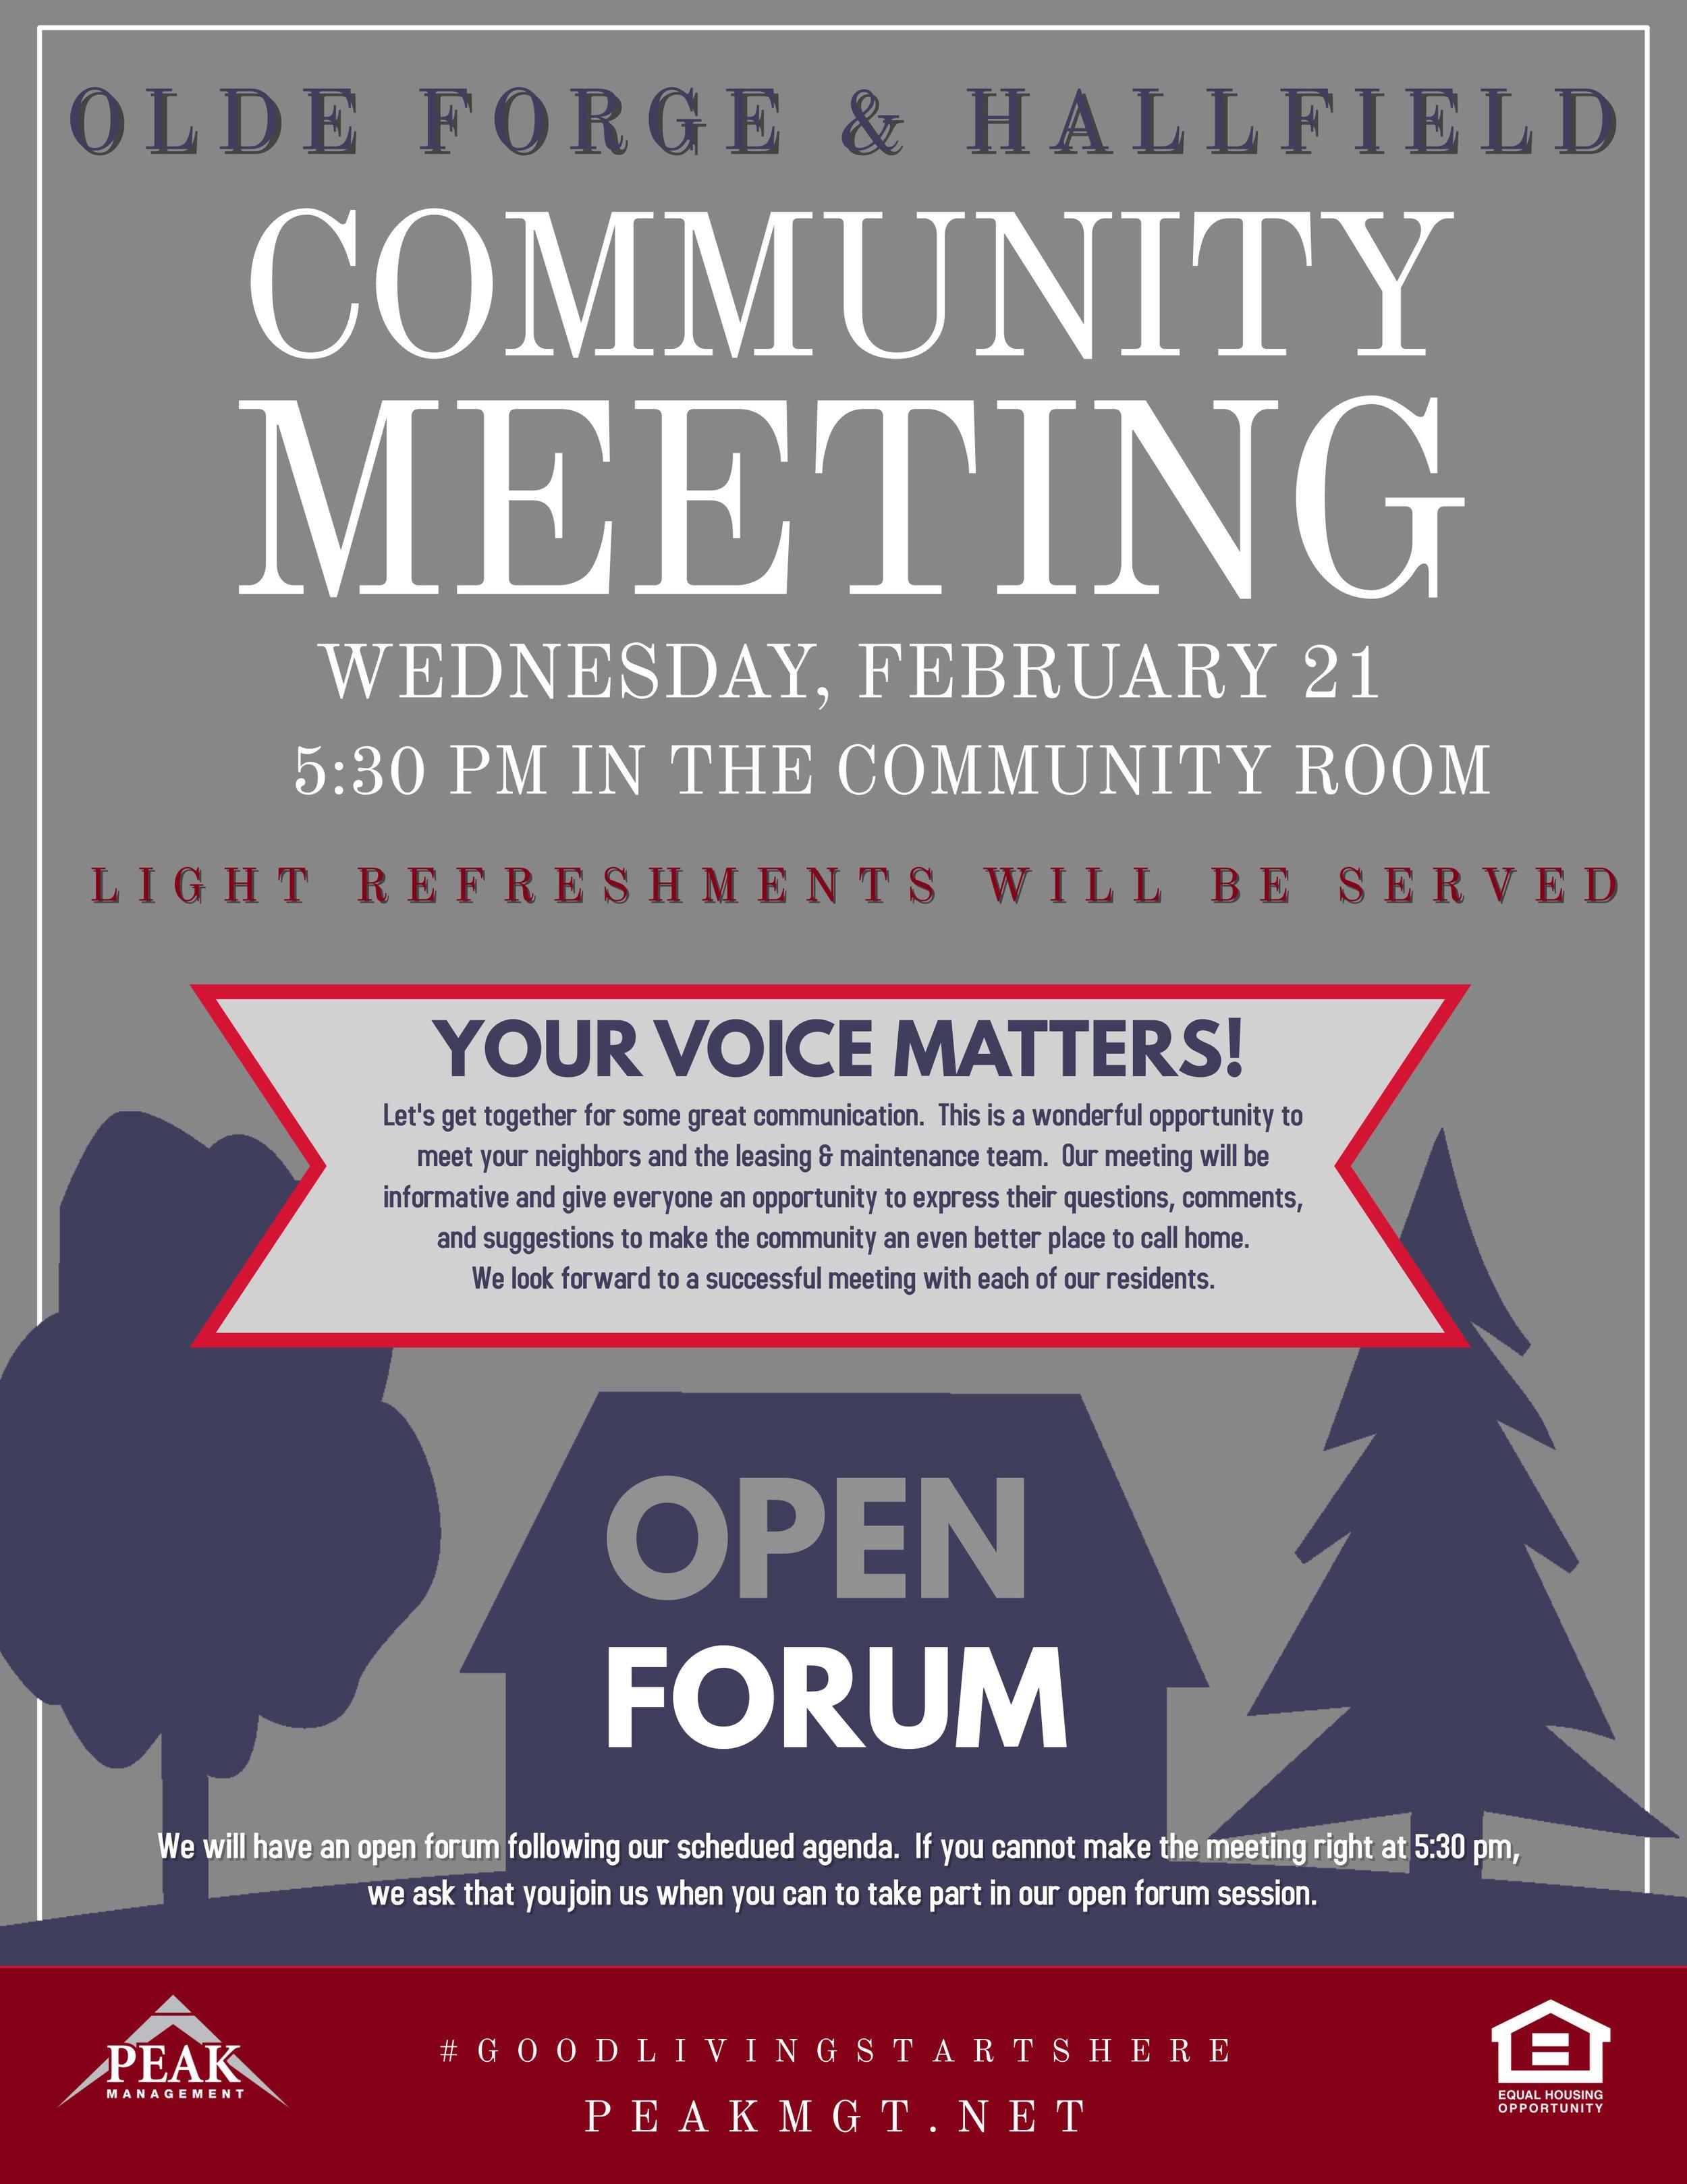 Community Meeting at Olde Forge & Hallfield